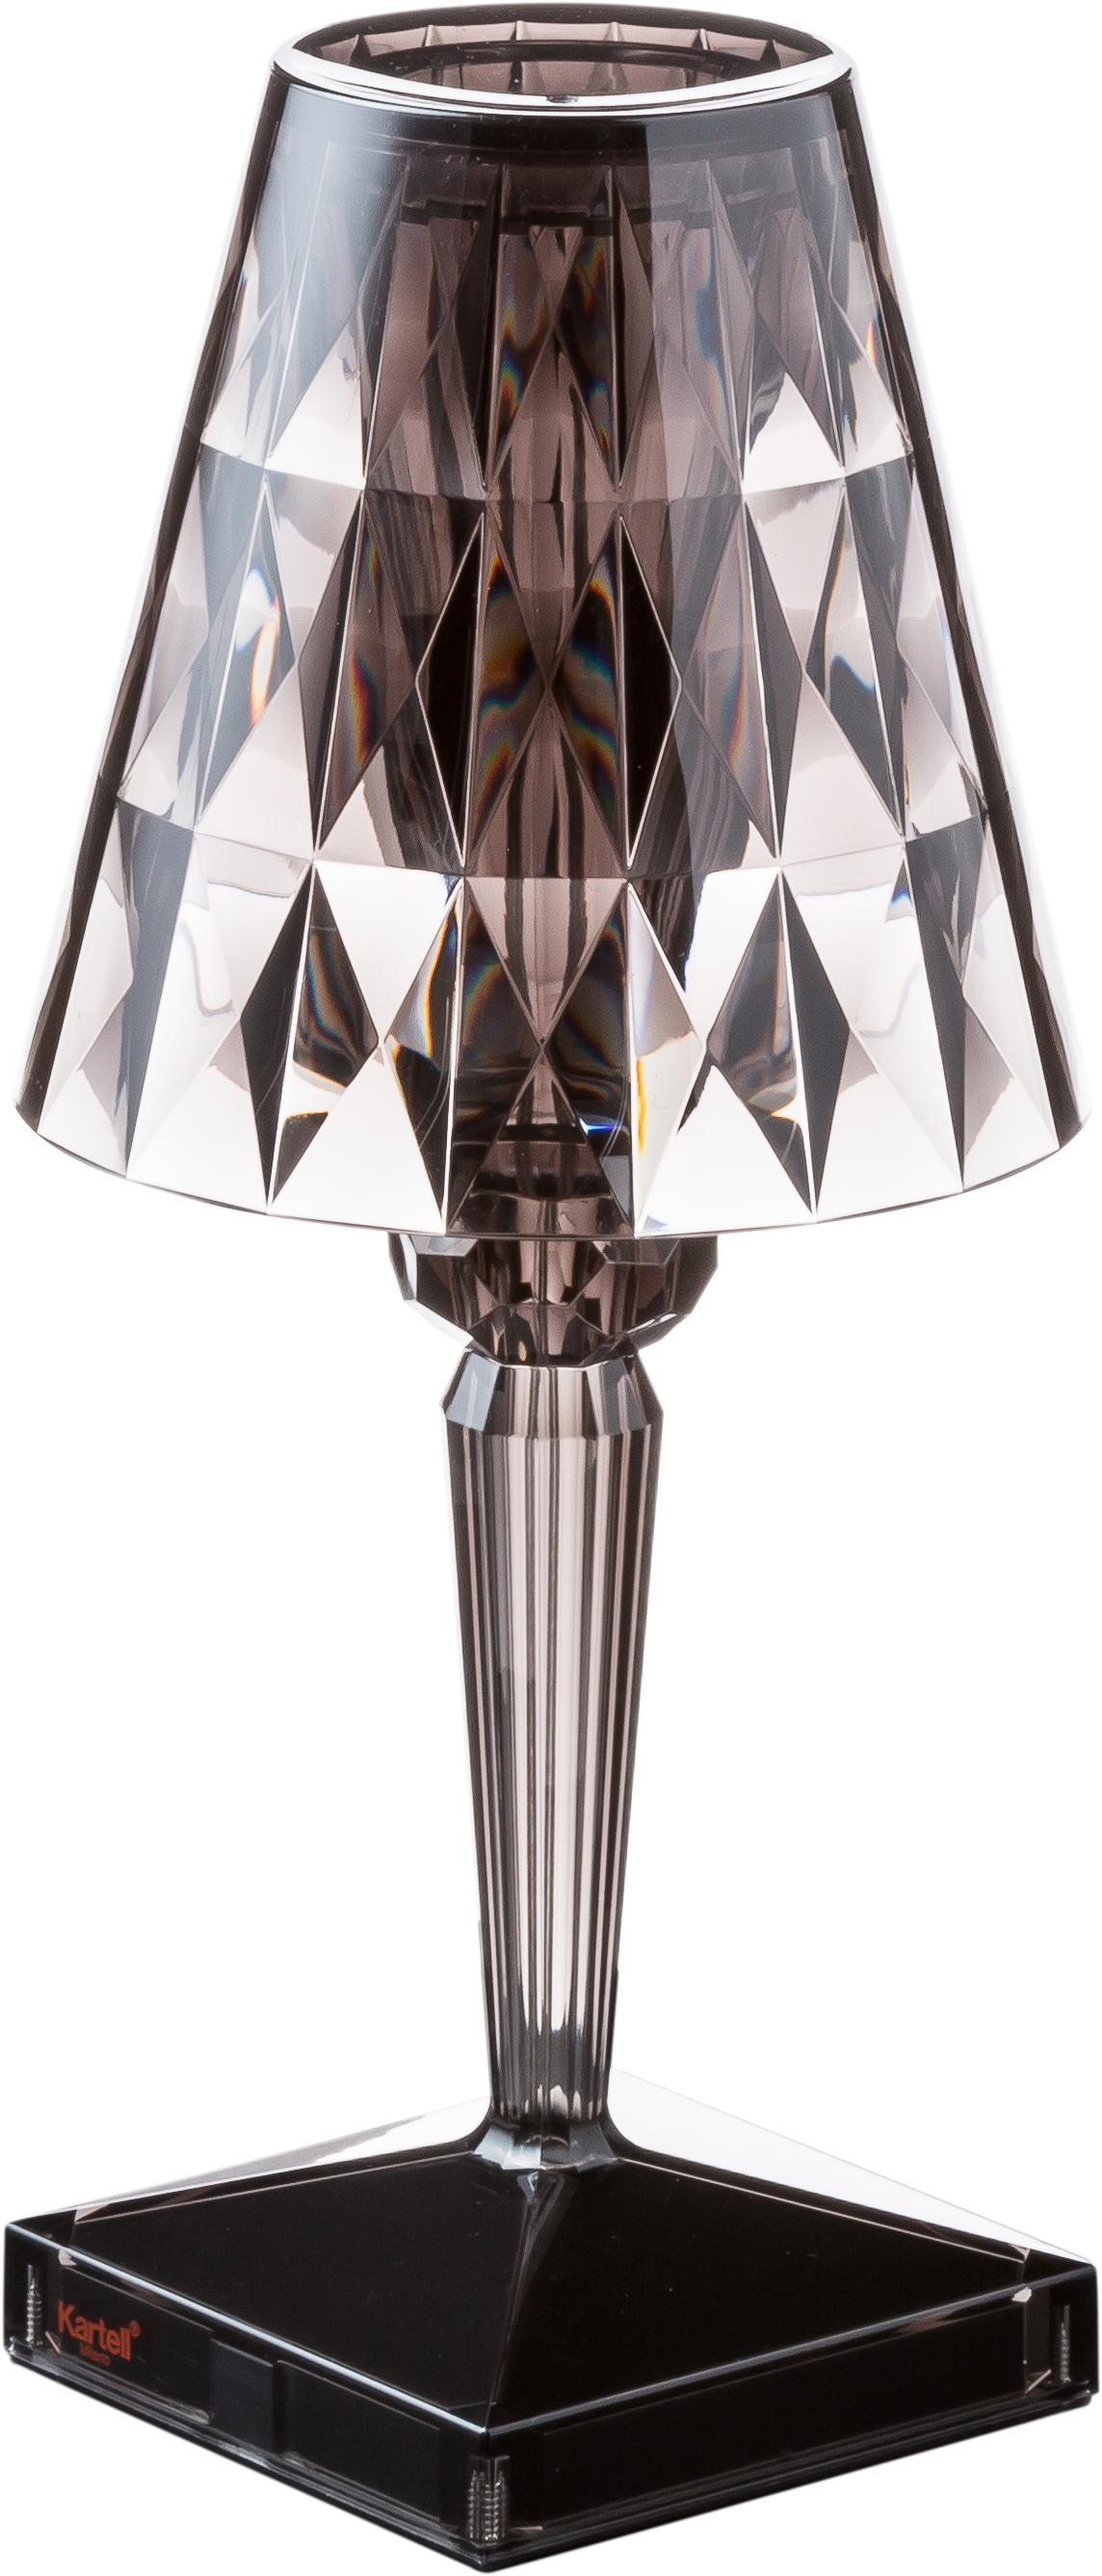 Lampada da tavolo a LED Battery, Materiale sintetico, Grigio trasparente, Ø 12 x Alt. 26 cm